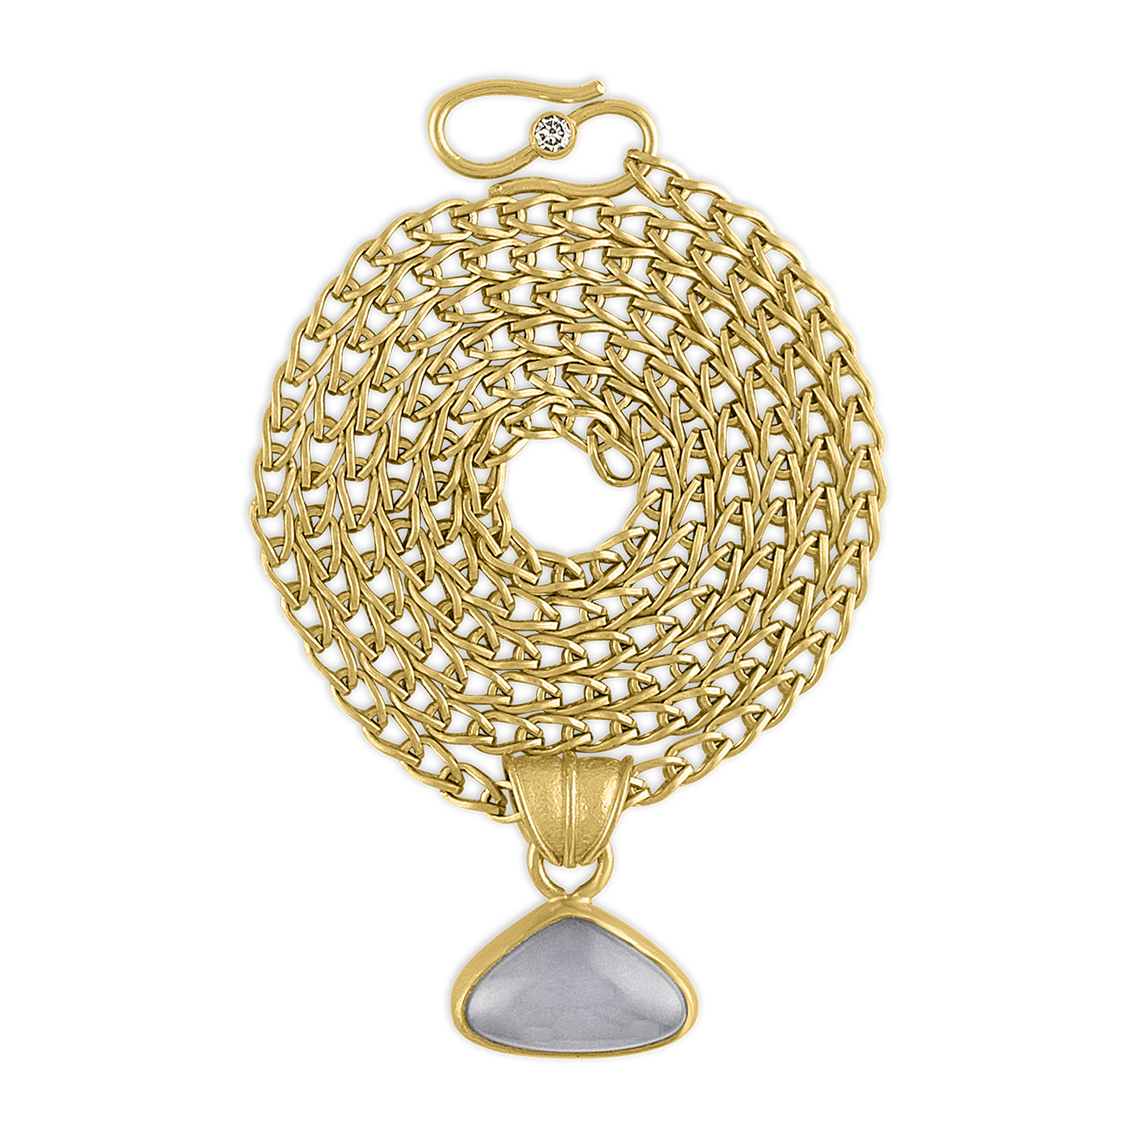 Prounis Jewelry - Jewelry / Photography